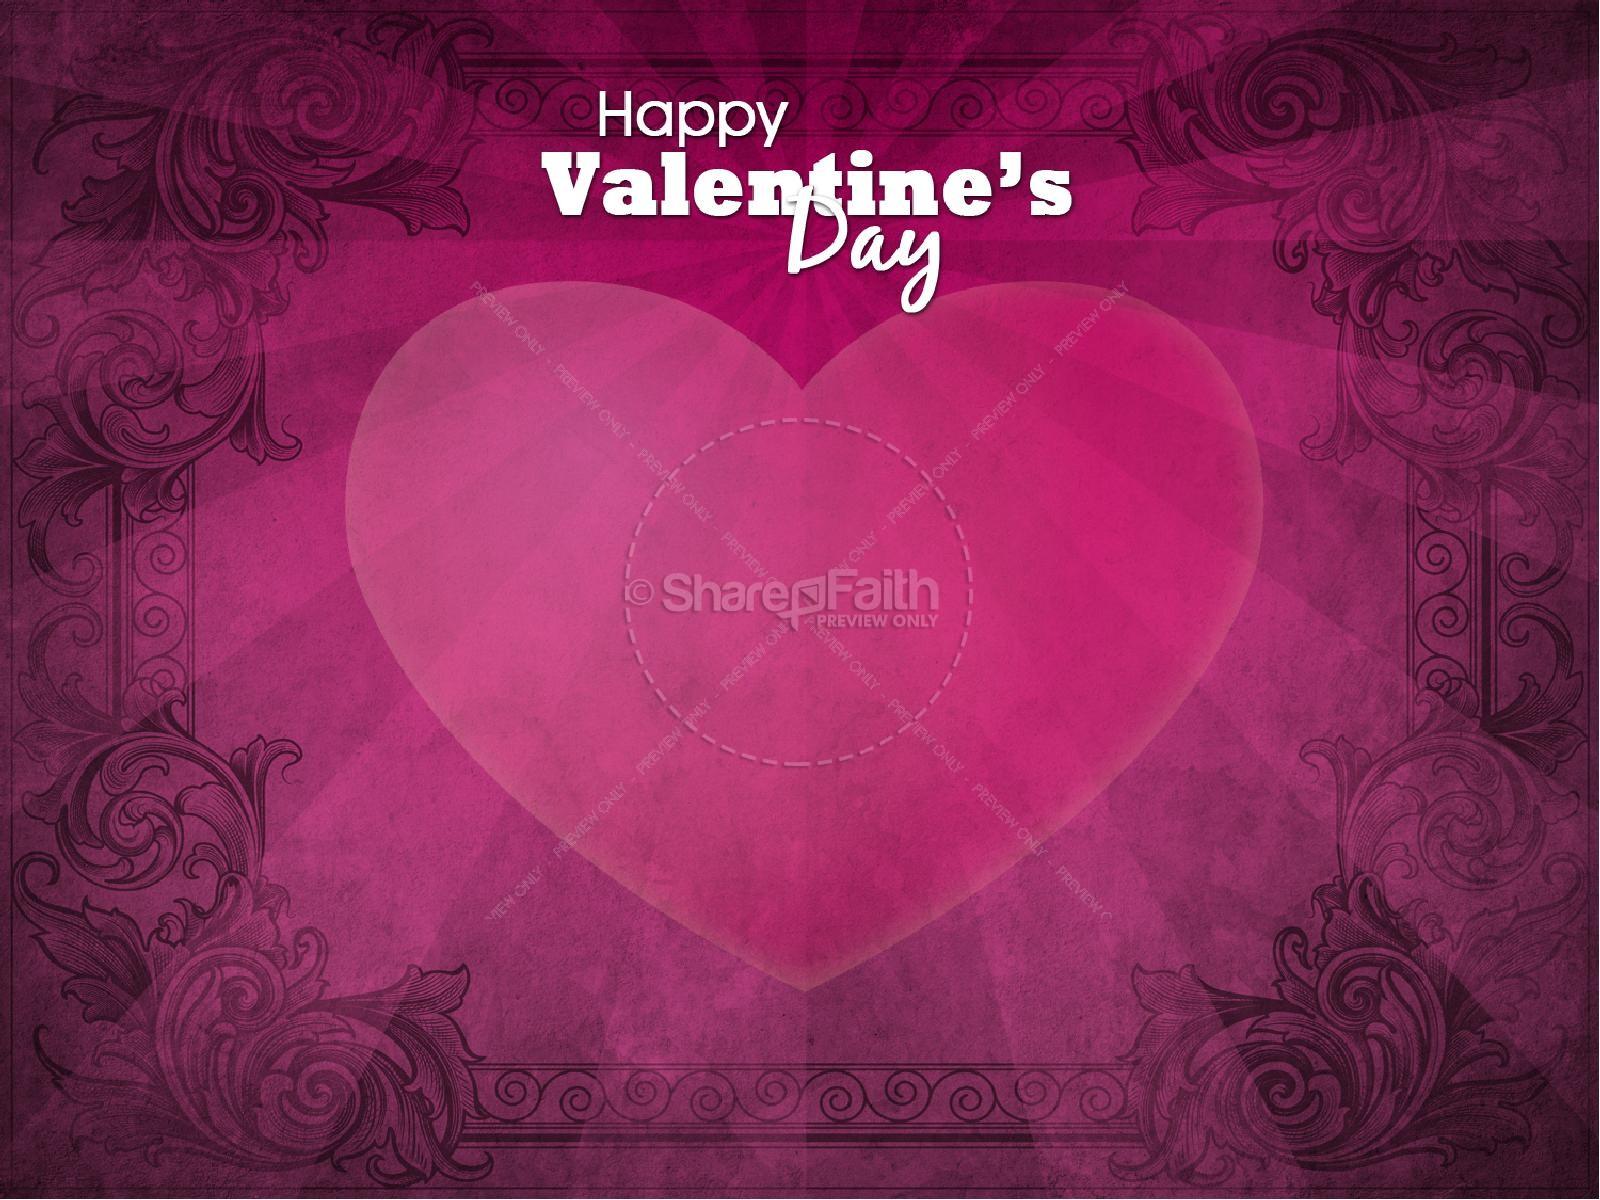 Happy Valentines Day   slide 2